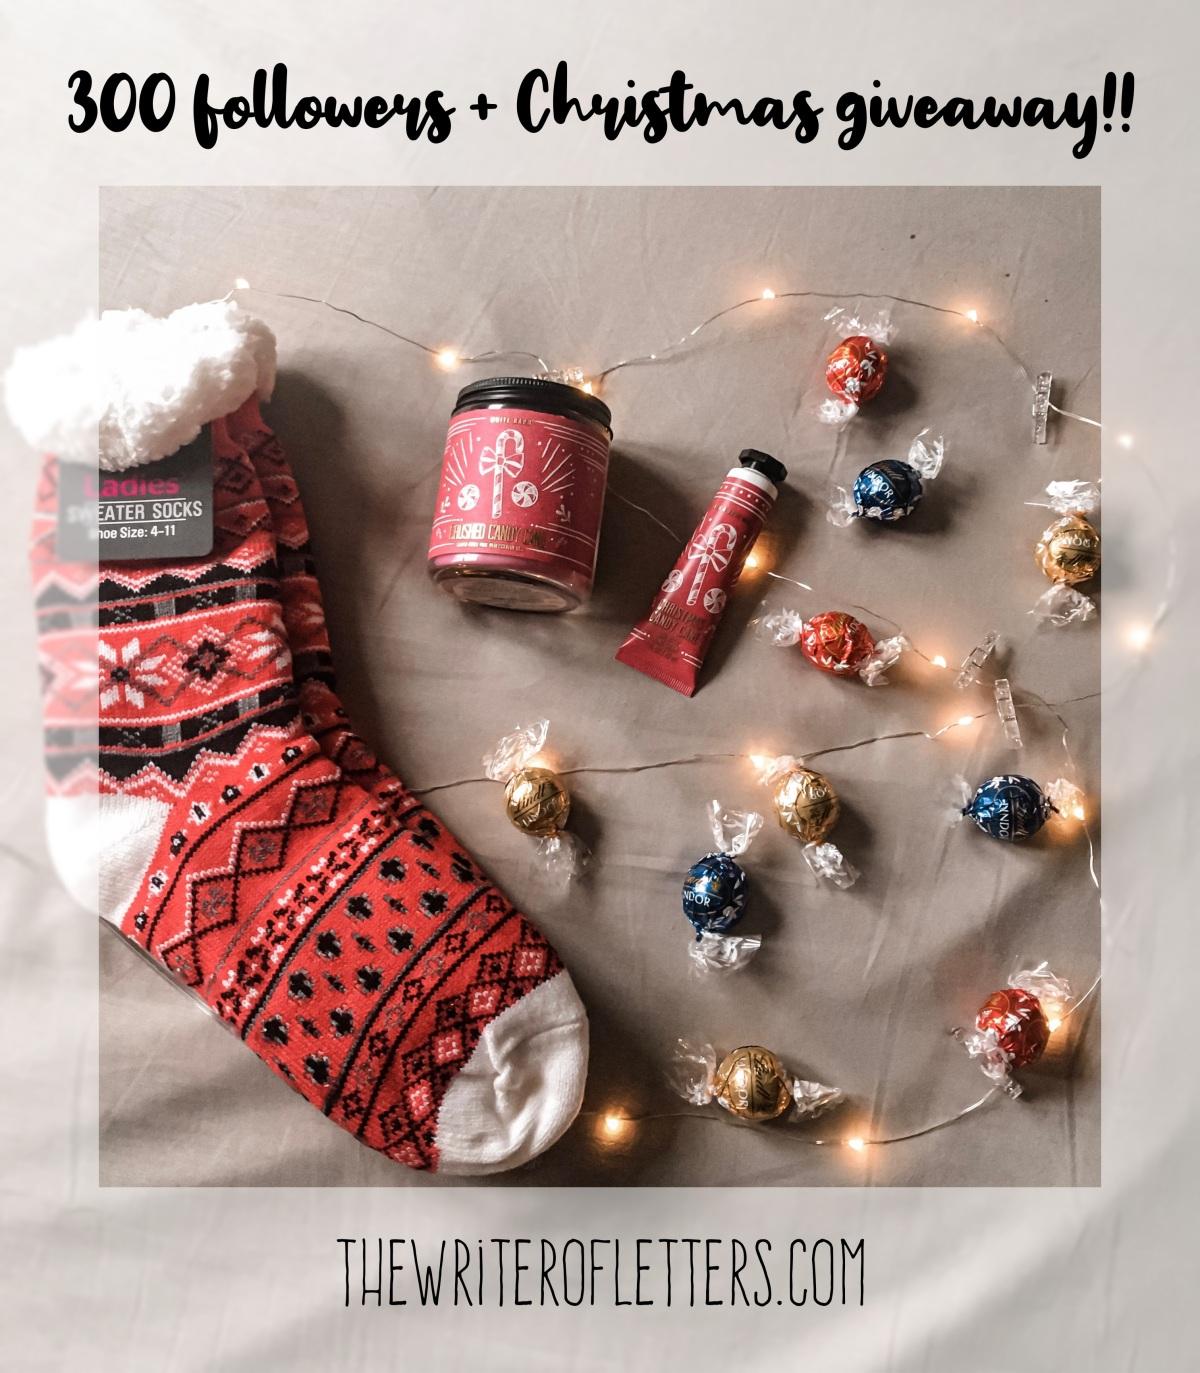 300 followers + Christmas giveaway!! *Confetti rains on usall*